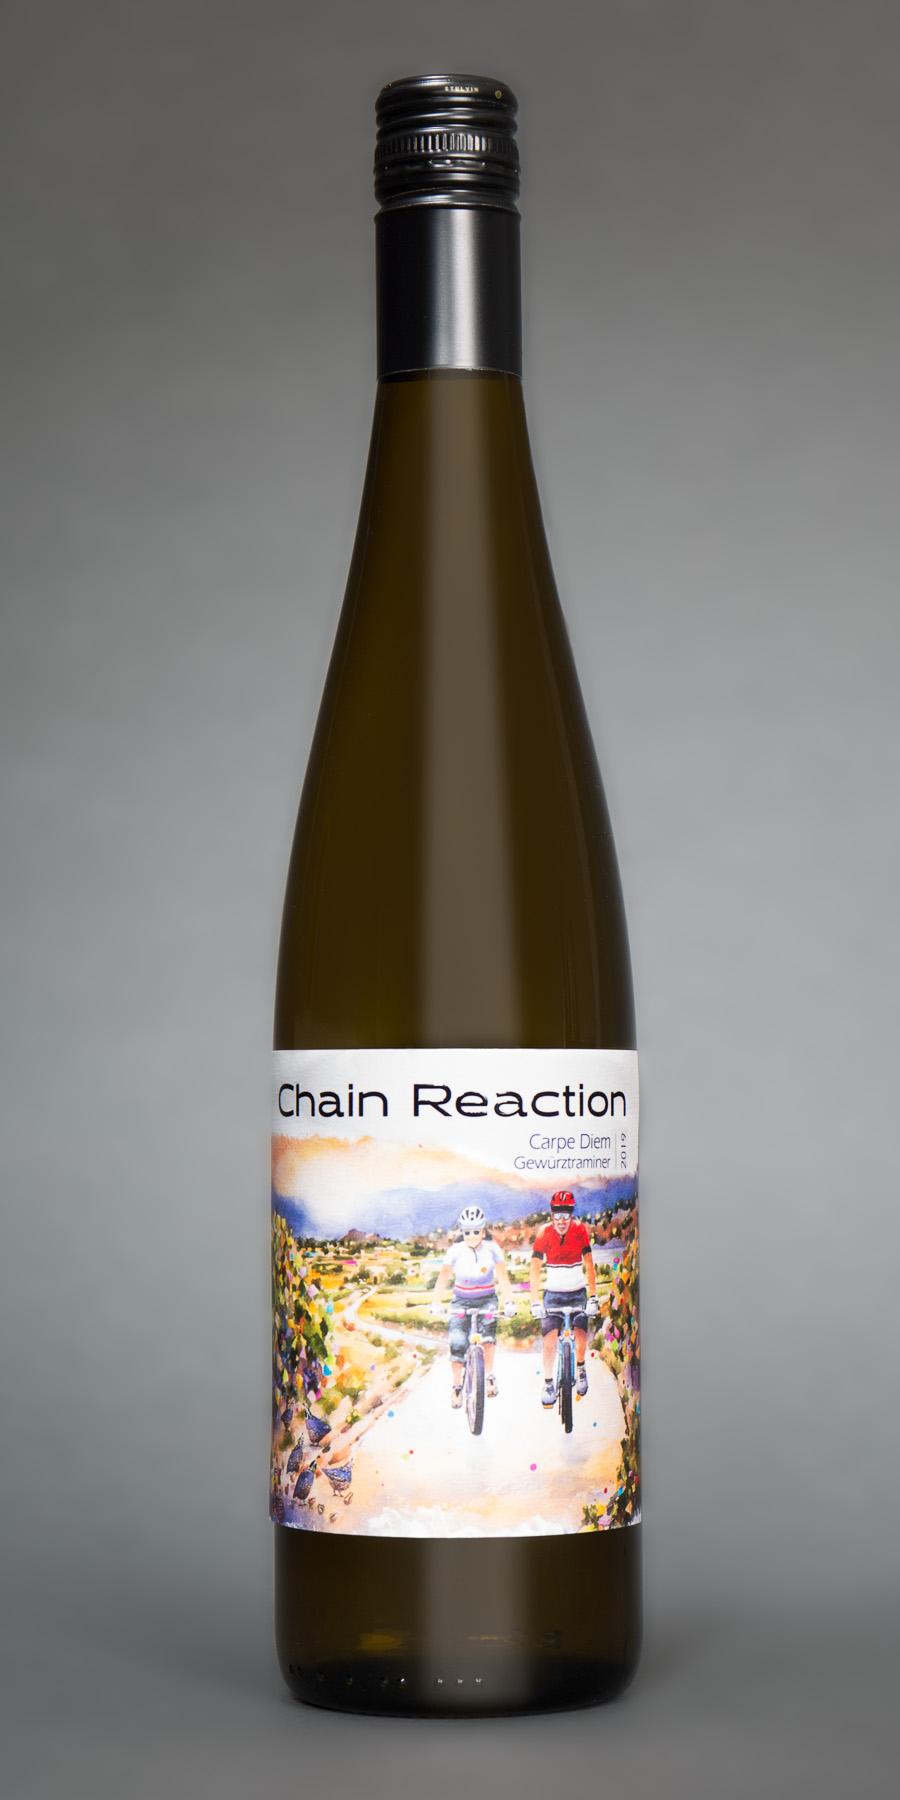 chain reaction gewurztraminer bottle